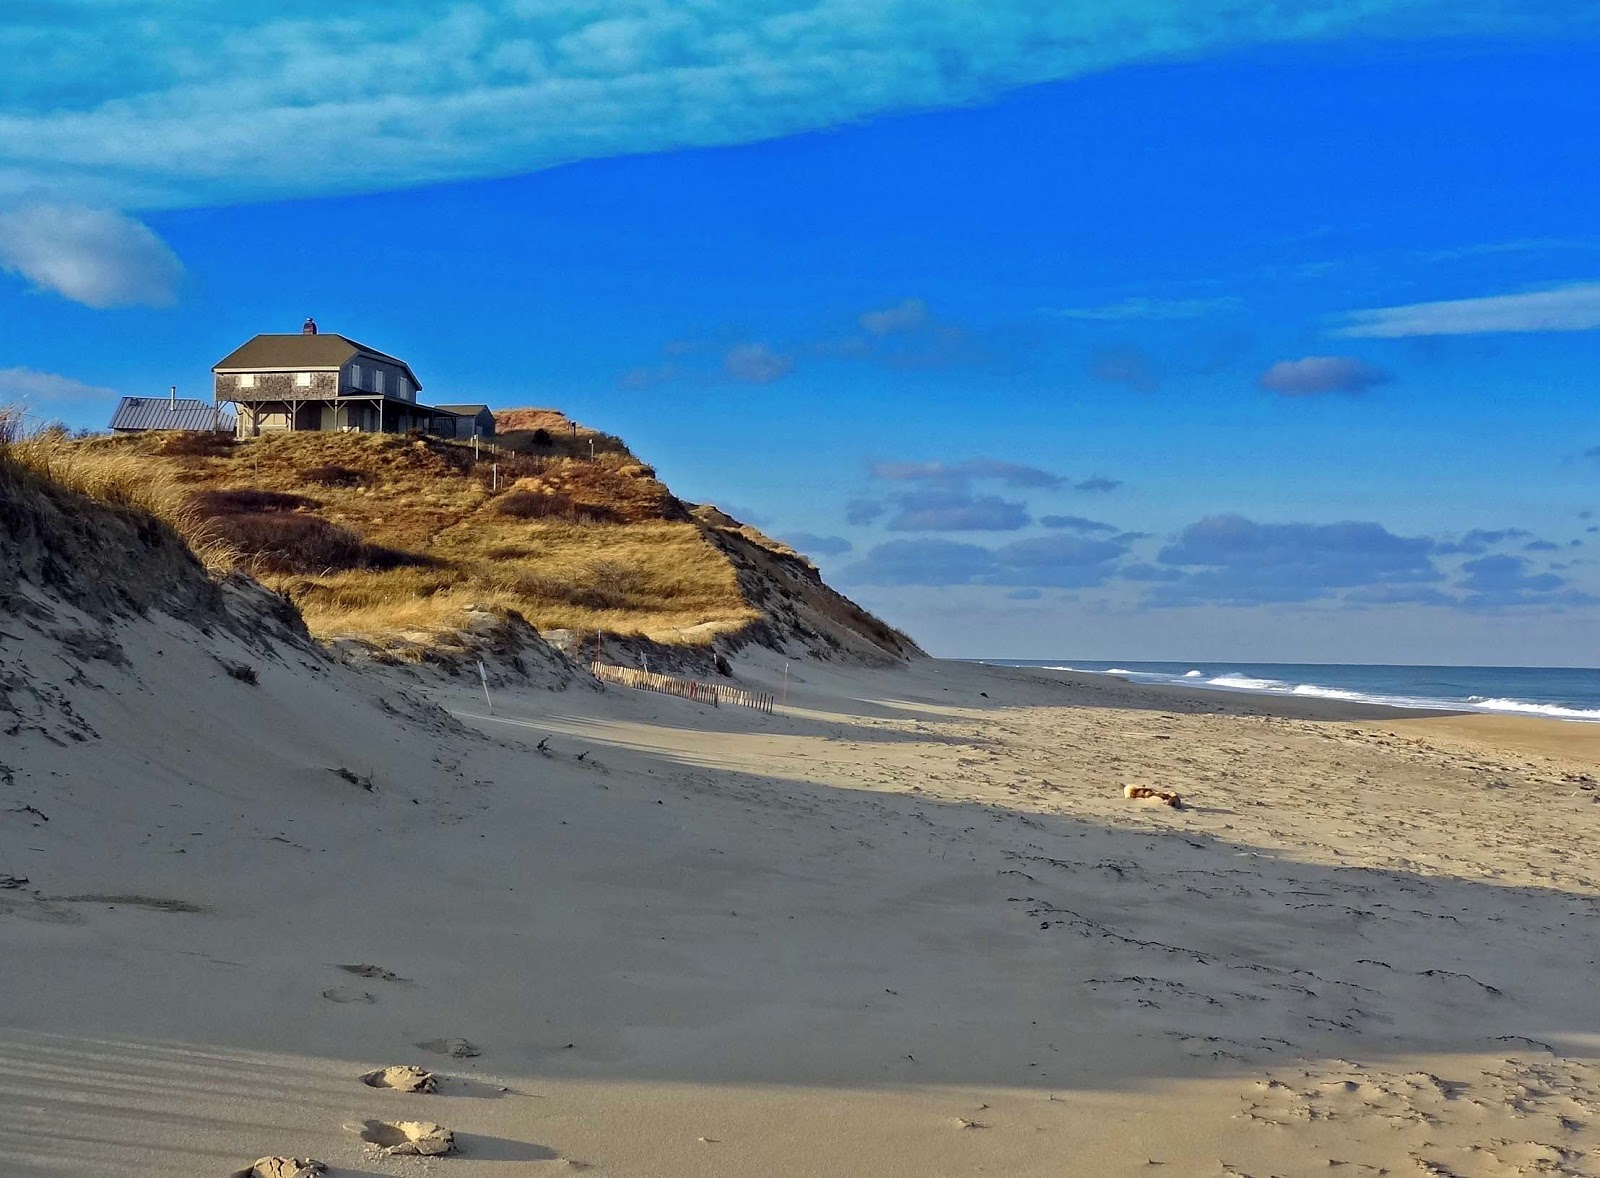 Joes Retirement Blog: Ballston Beach, Truro, Cape Cod